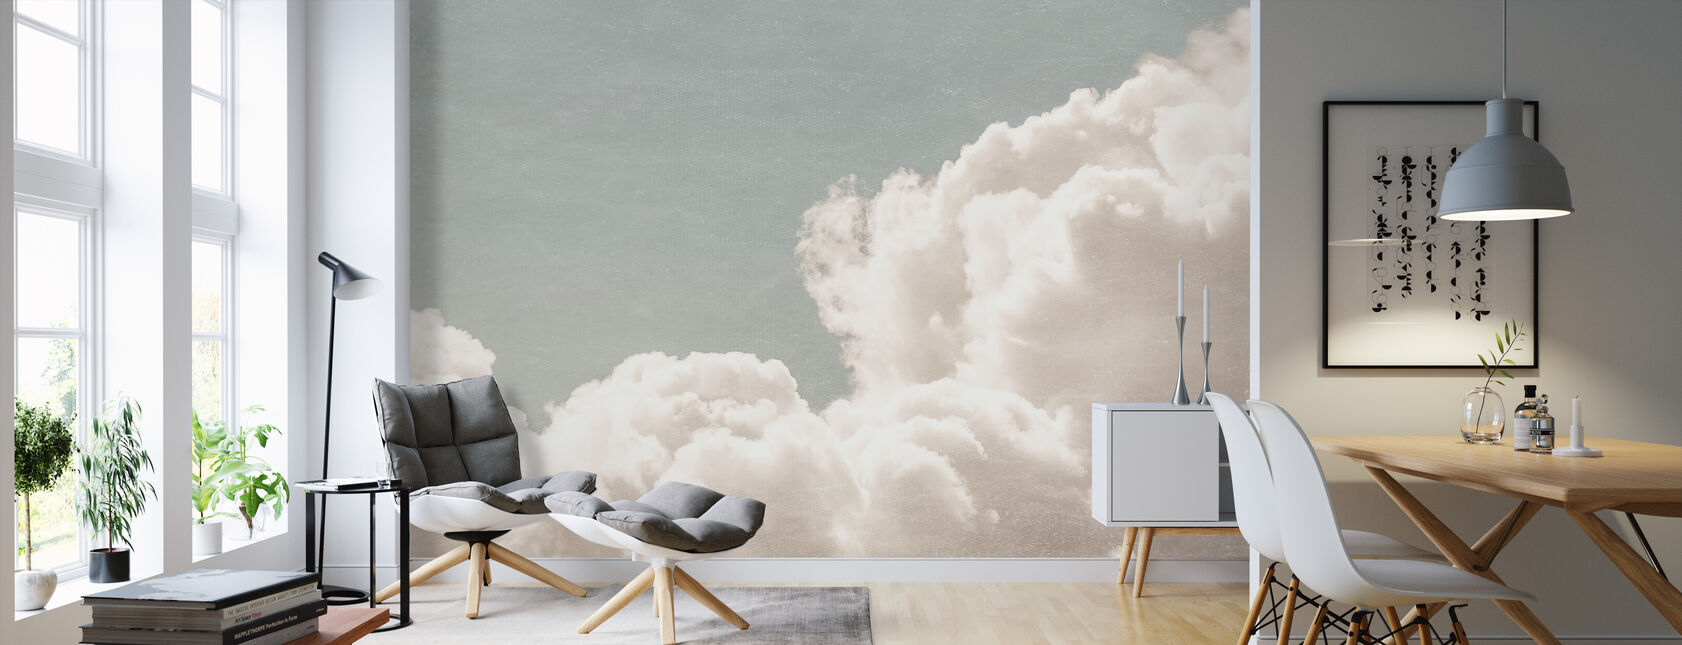 Blush Clouds Daydream Filter - Wallpaper - Living Room